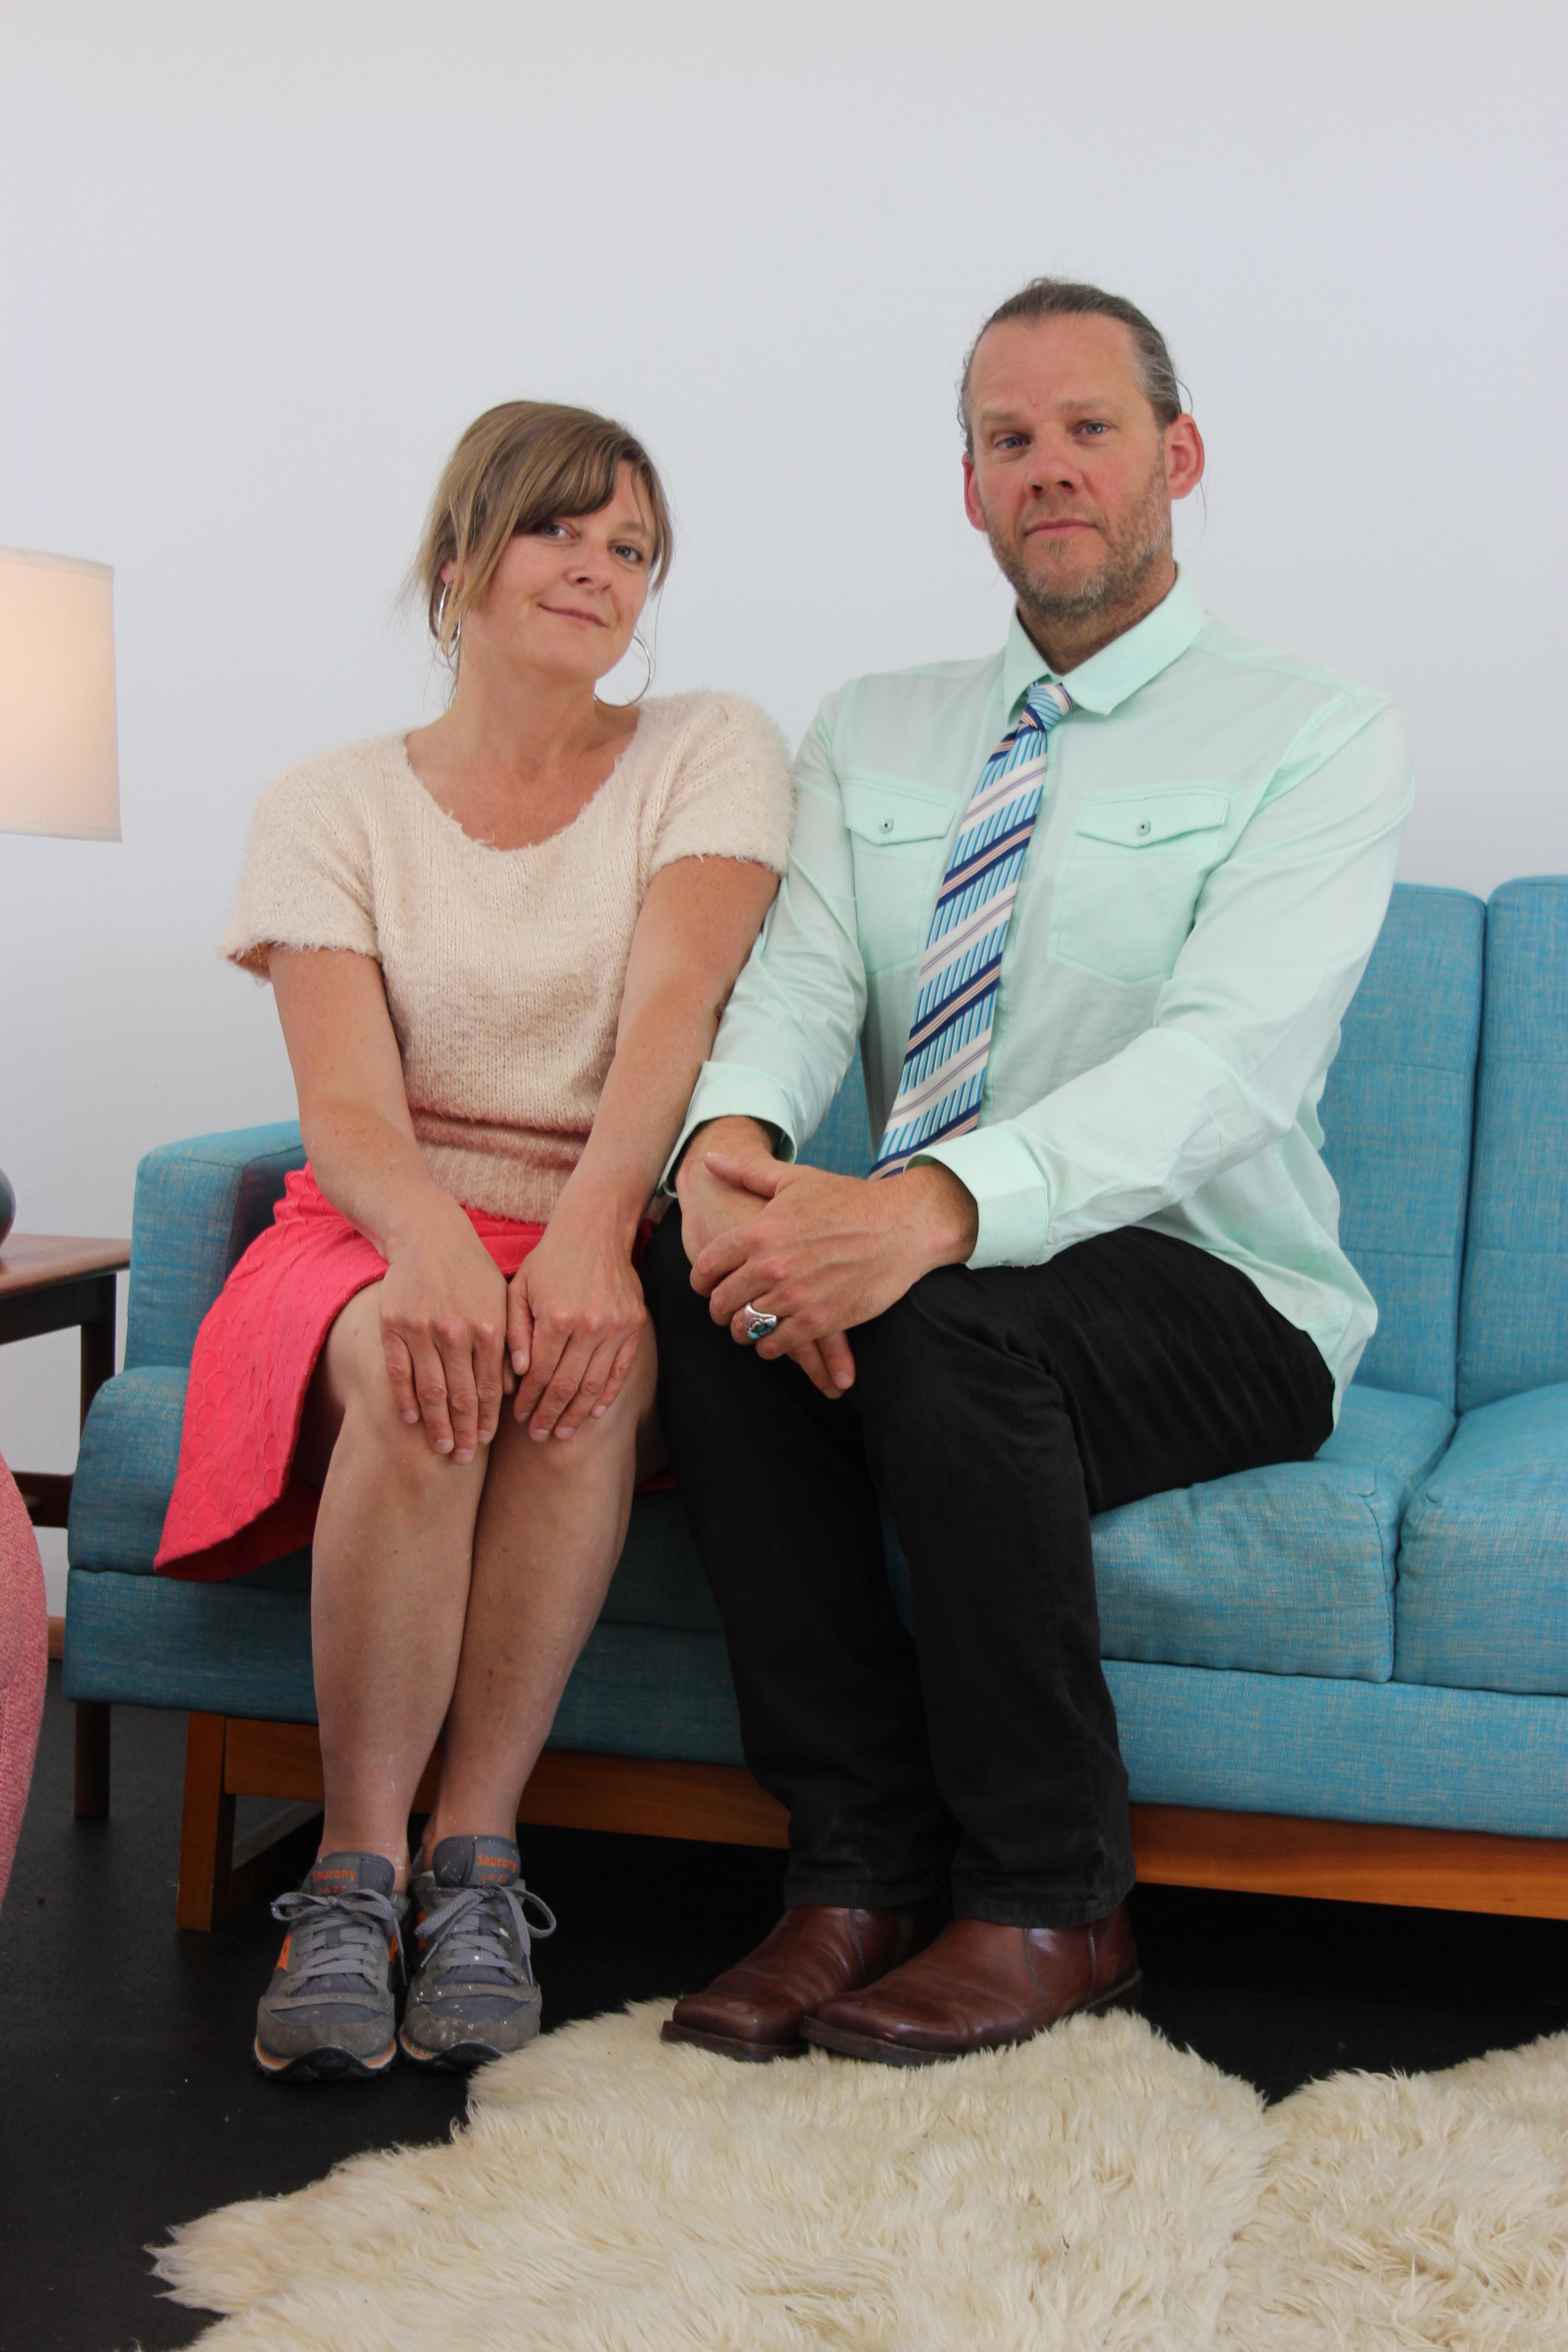 Jodi Rockwell & Shawn Landis